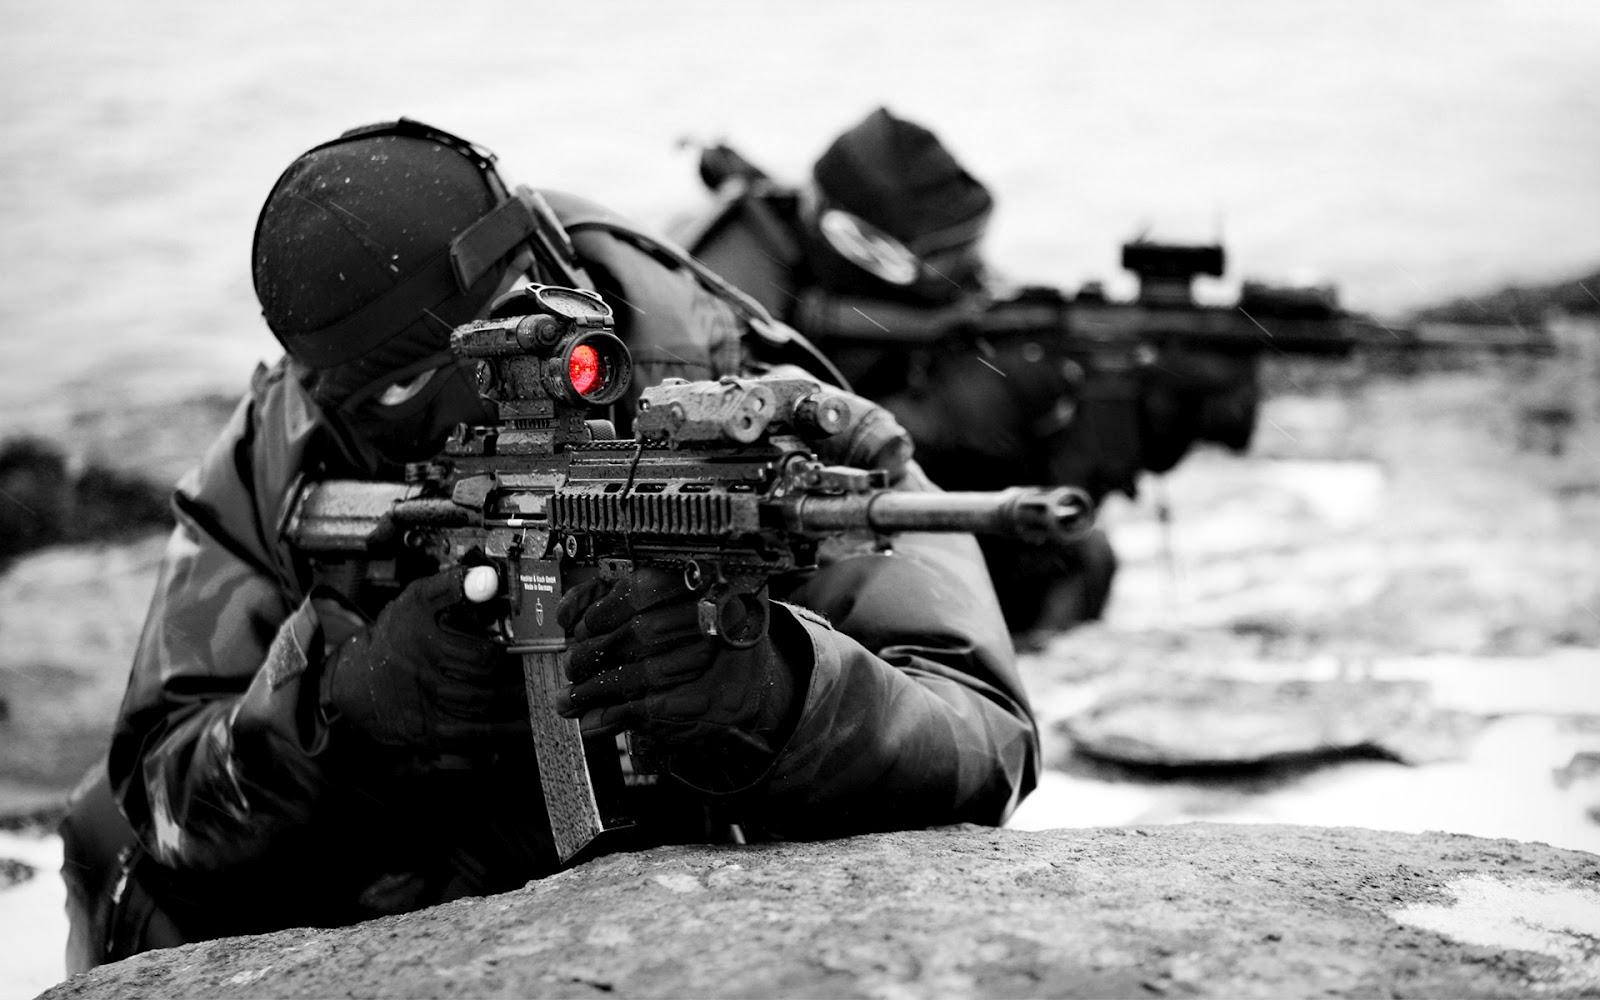 http://4.bp.blogspot.com/-xVCbTLcRzAs/UGn8Ruyuu4I/AAAAAAAABnU/lkdoHQocmV0/s1600/Guns-Wallpapers%20%20(13).jpg